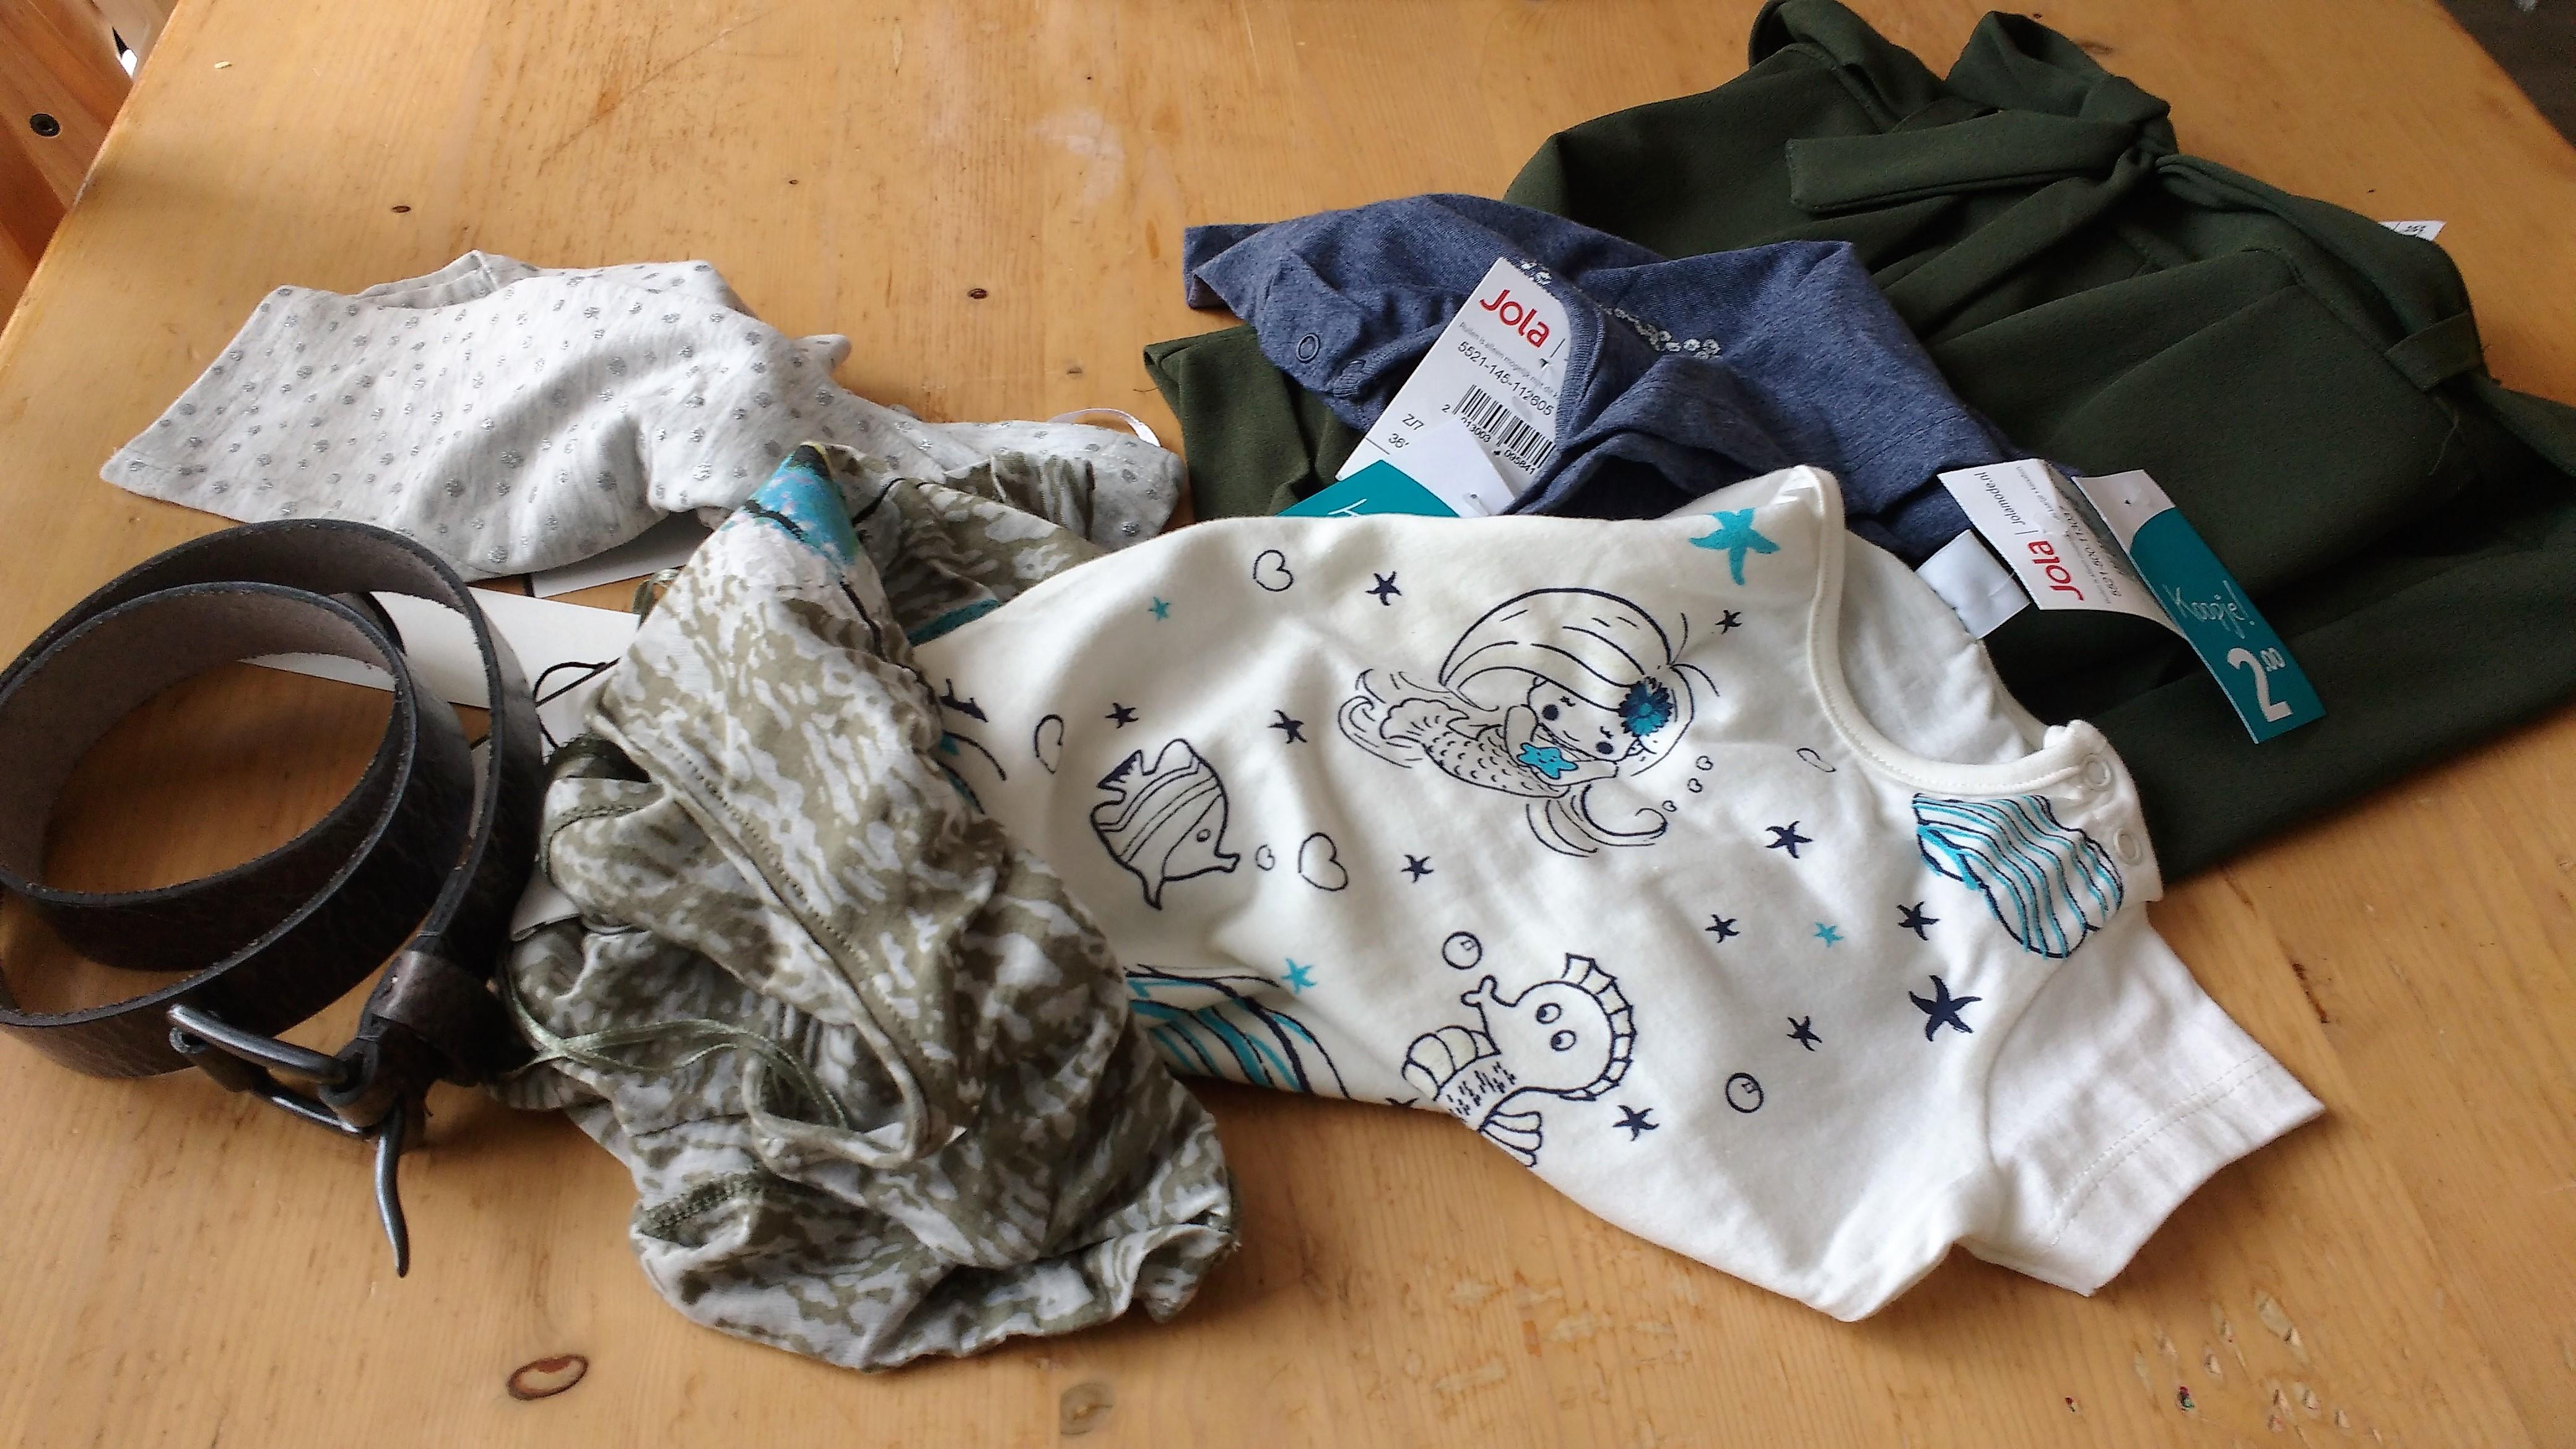 shoplog, Zeeman, Hema, Jola, kinderkleding, budget, winkelen, blog, mamablog, mama-lifestyle blog, La Log